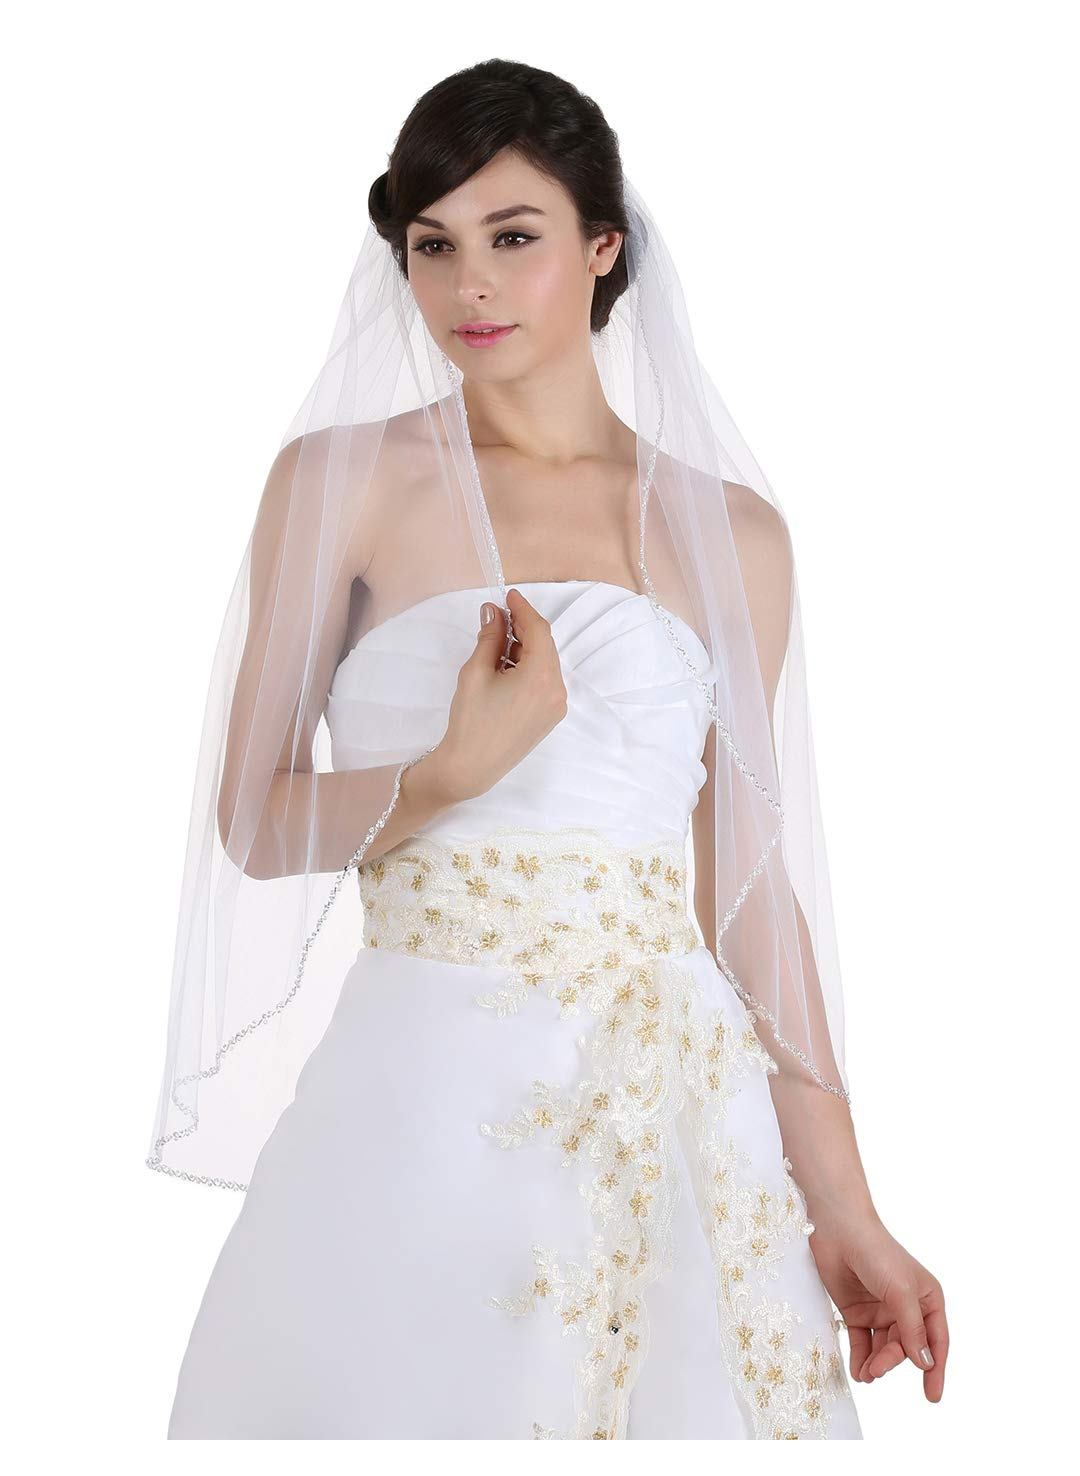 1T 1 Tier Crystals Pearls Beaded Wedding Veil (Fingertip Length 36'' Ivory) by SAMKY